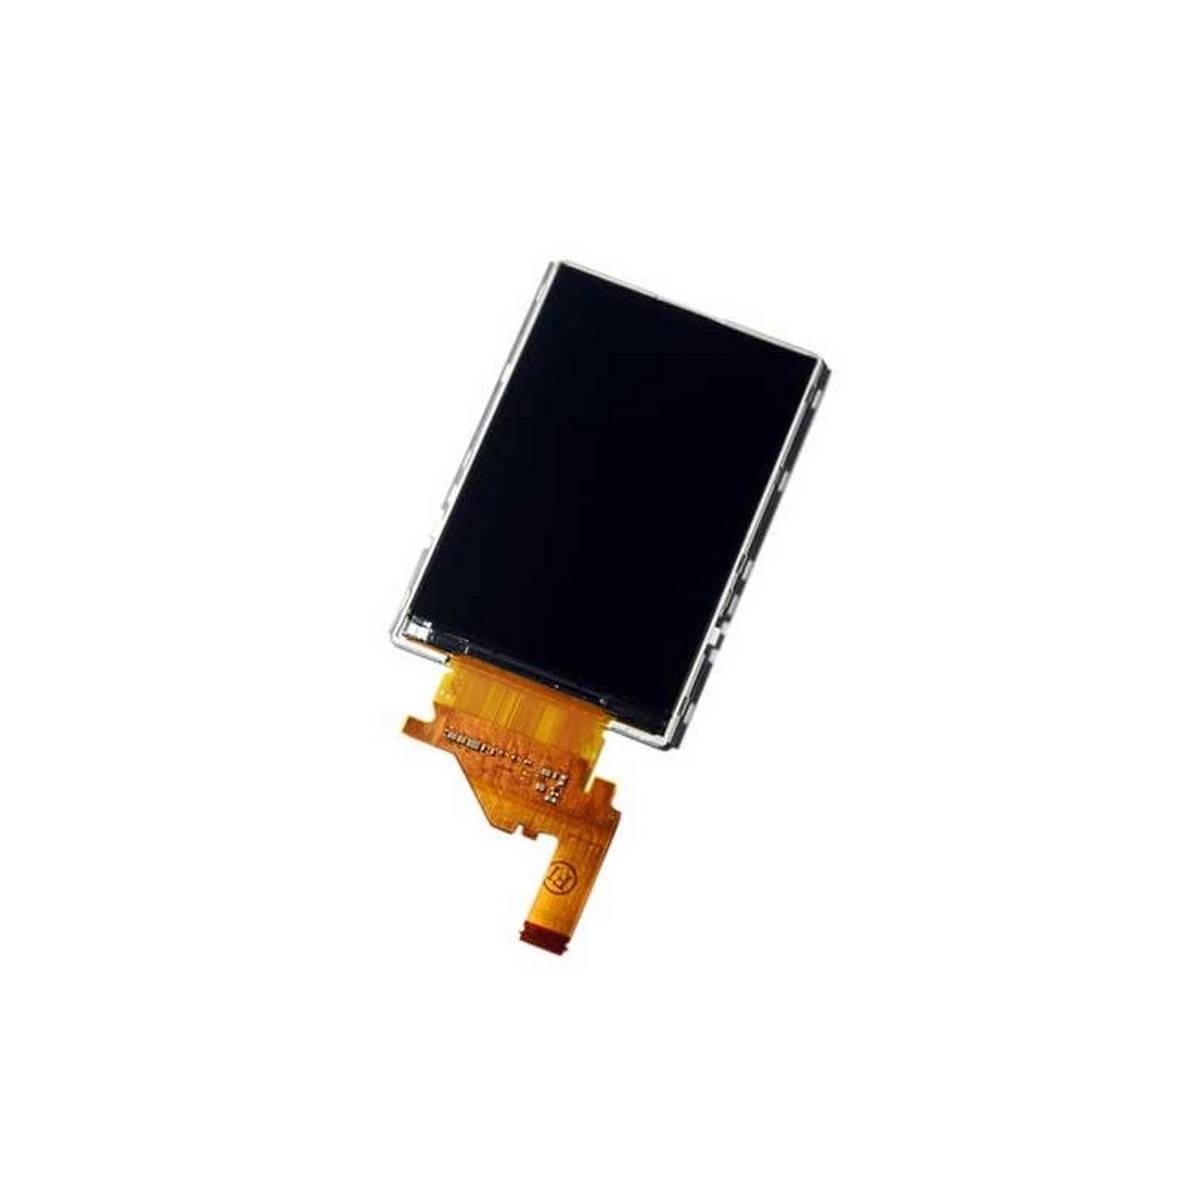 Pantalla (Display) para Sony Ericsson Xperia X8, E15a, E15i